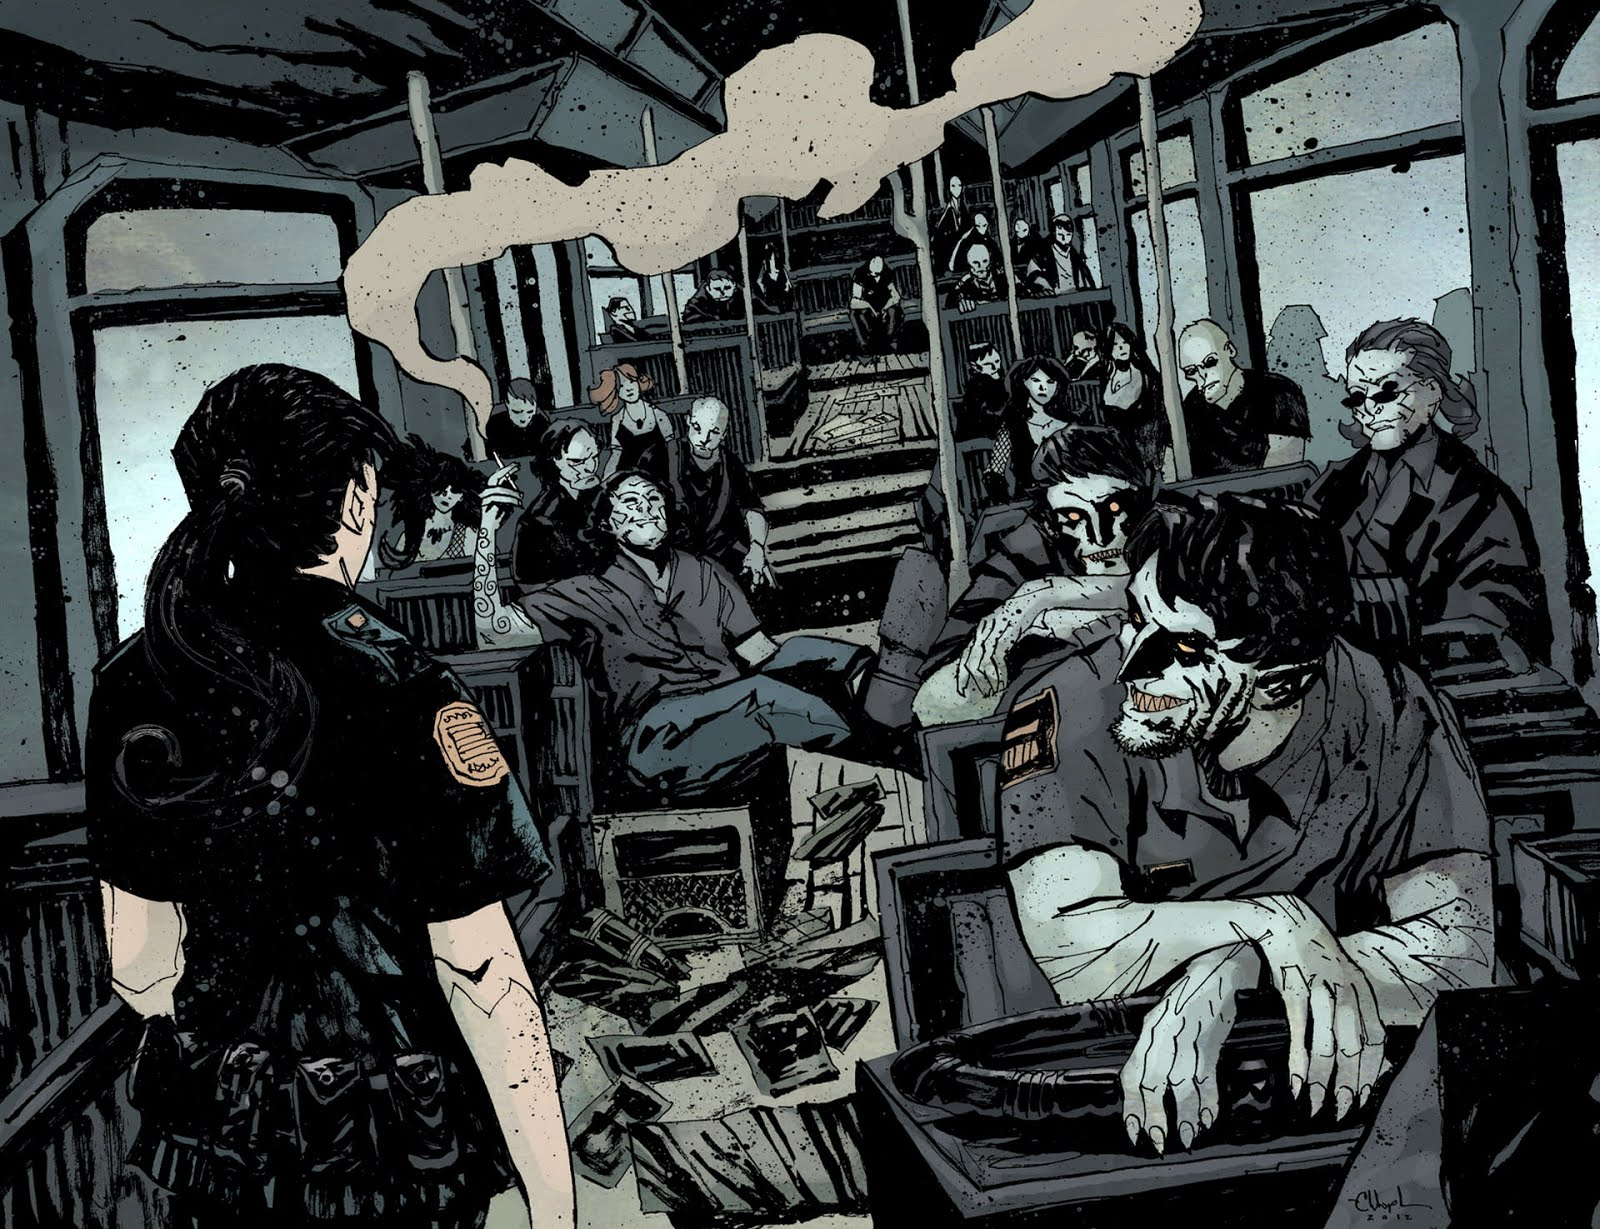 Comic Wallpapers 30 Days Of Night Comic Wallpaper